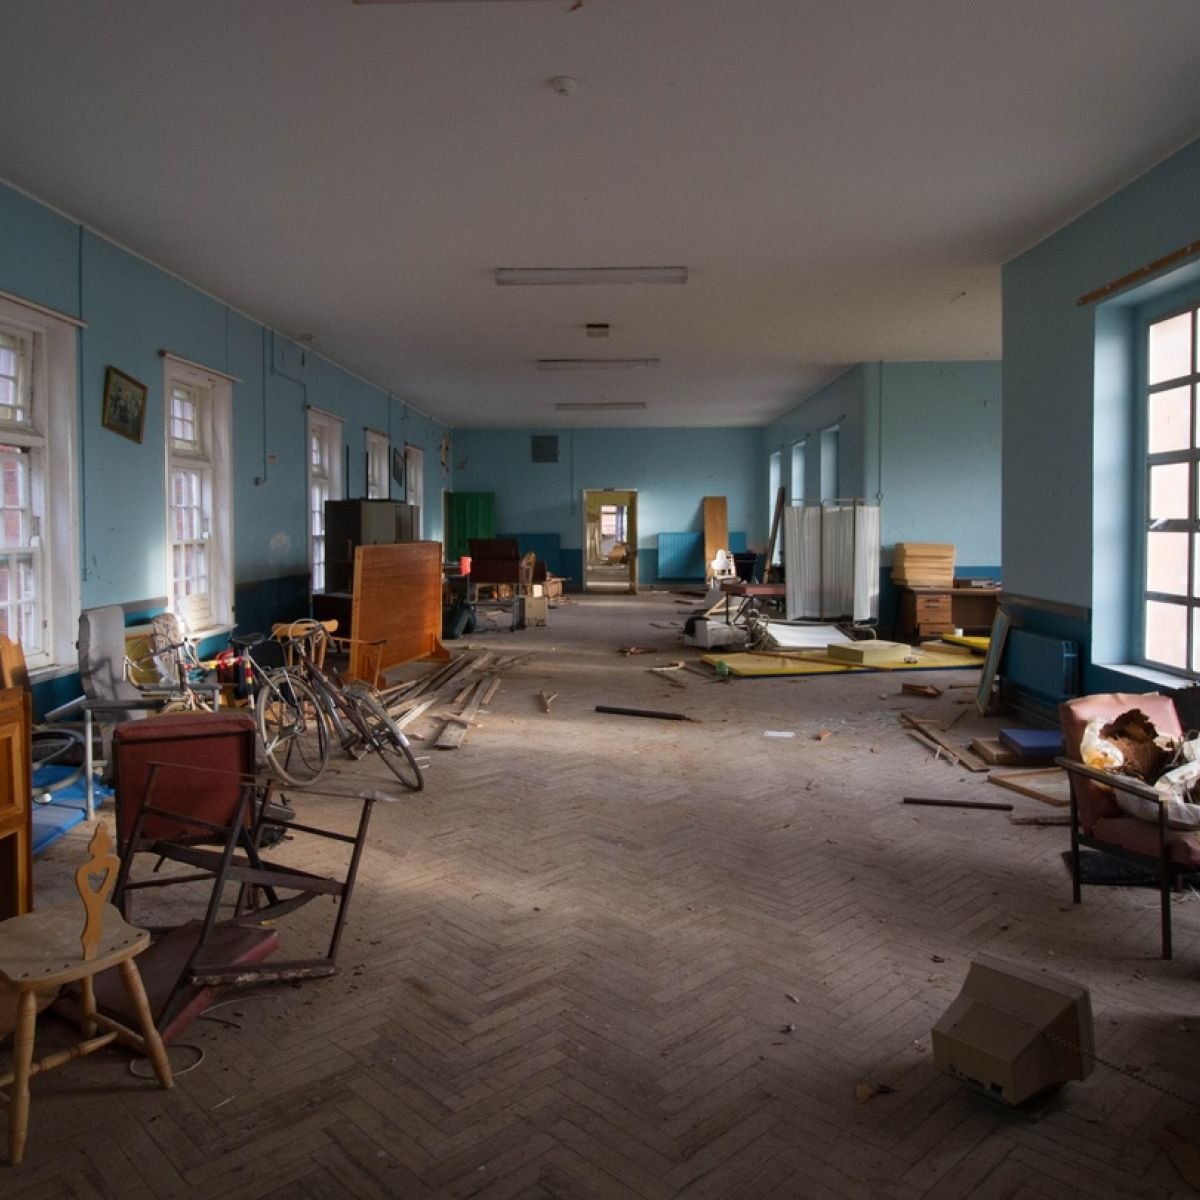 Hidden stories of abandoned mental hospital revealed